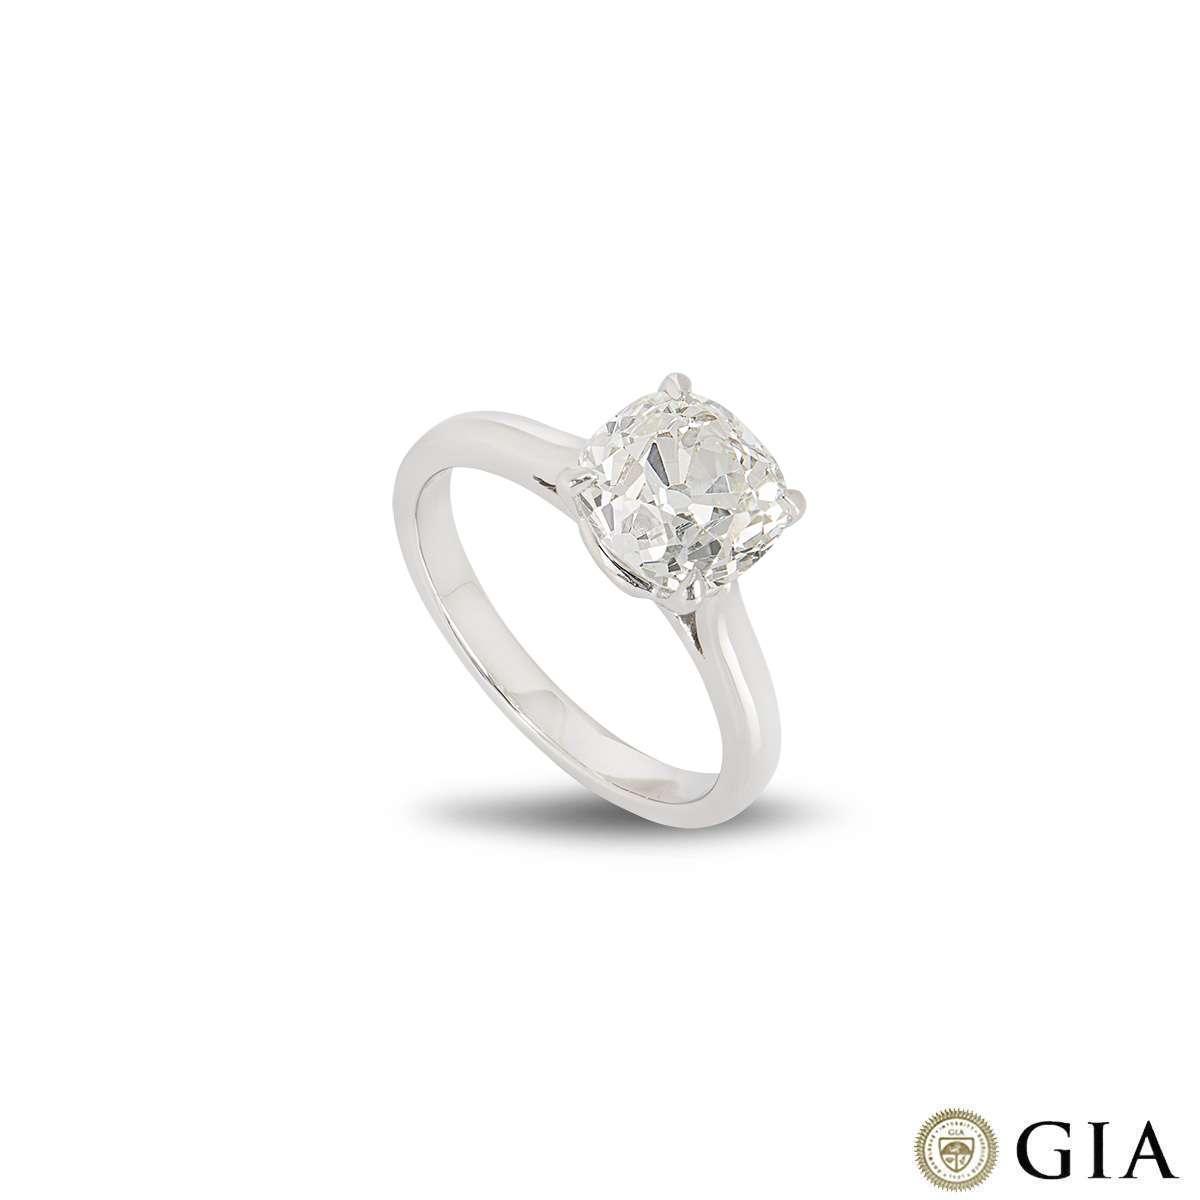 Old Mine Cut Diamond Ring 2.73ct K/VS1